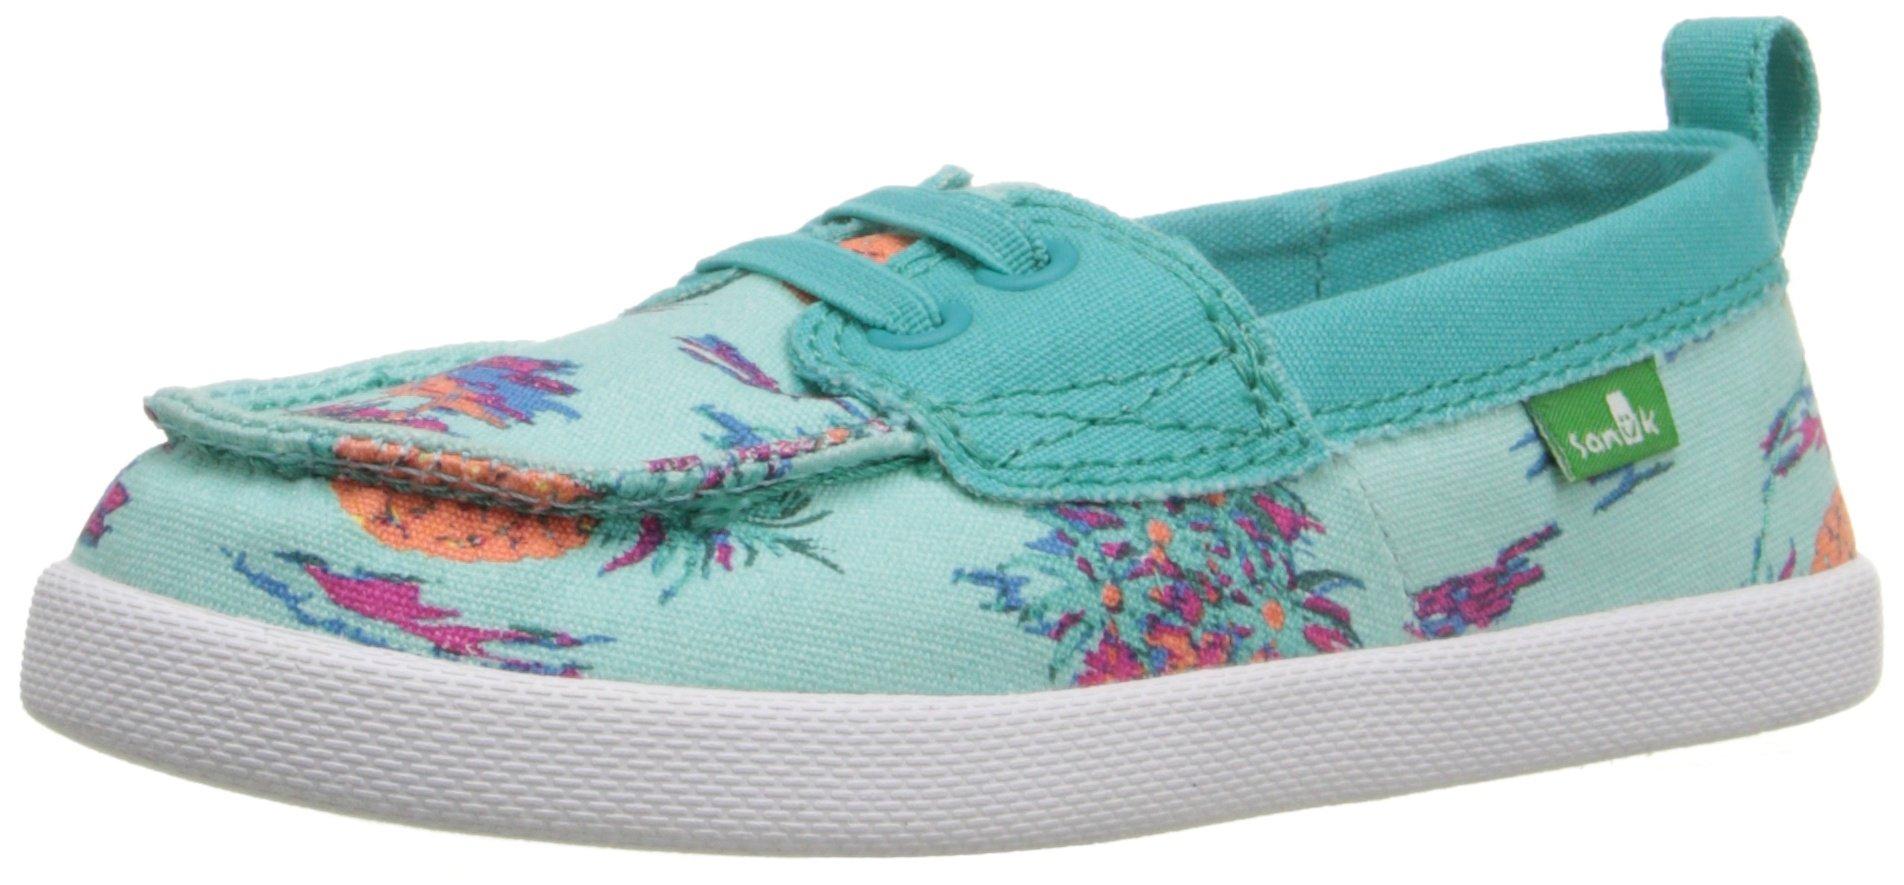 Sanuk Kids Sailaway Mate-K Boat Shoe (Toddler/Little Kid), Turquoise/Pineapples, 8 M US Toddler